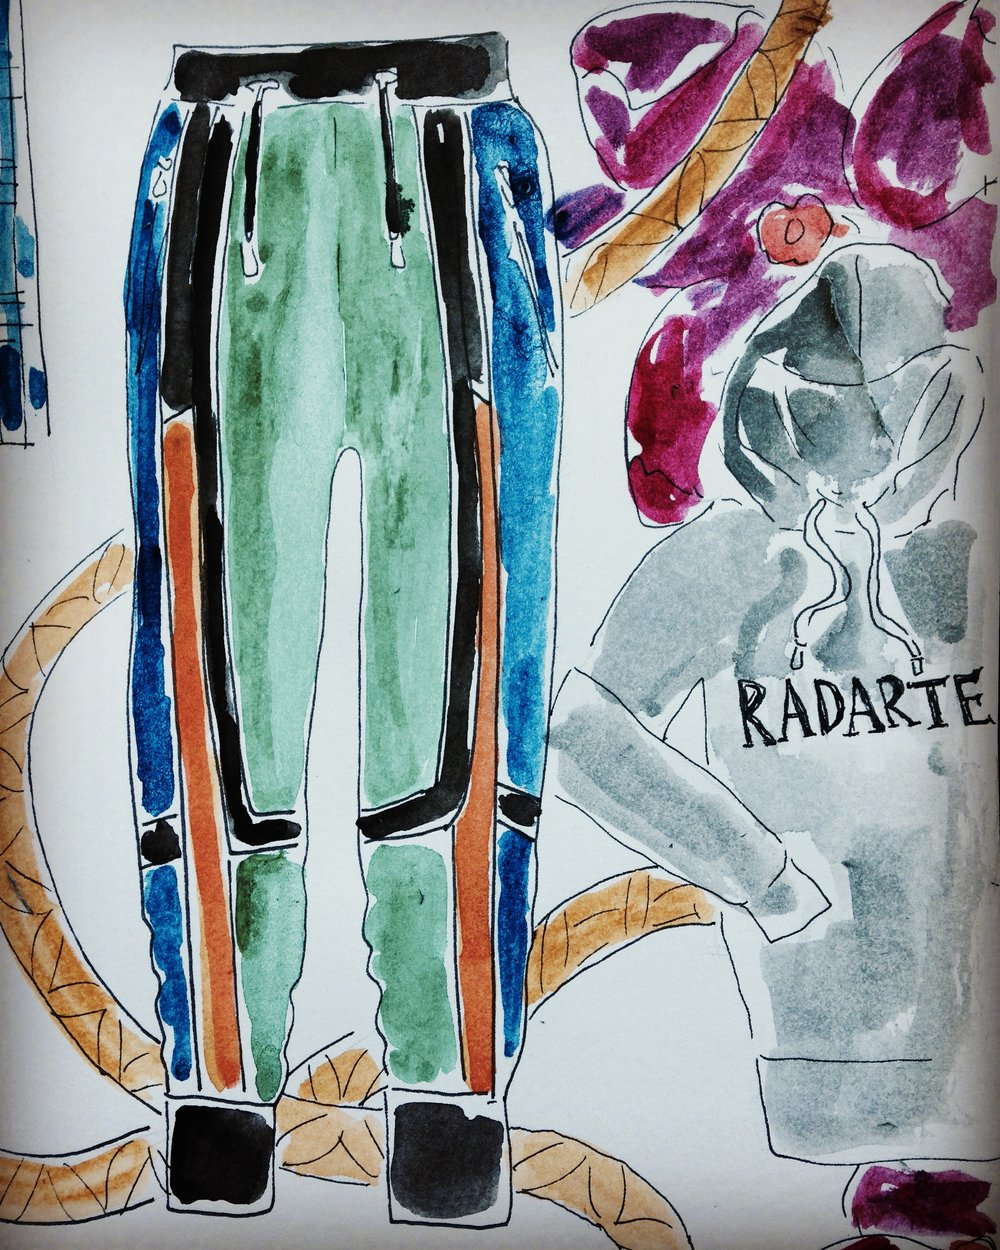 Radarte hoodie with balmain joggers